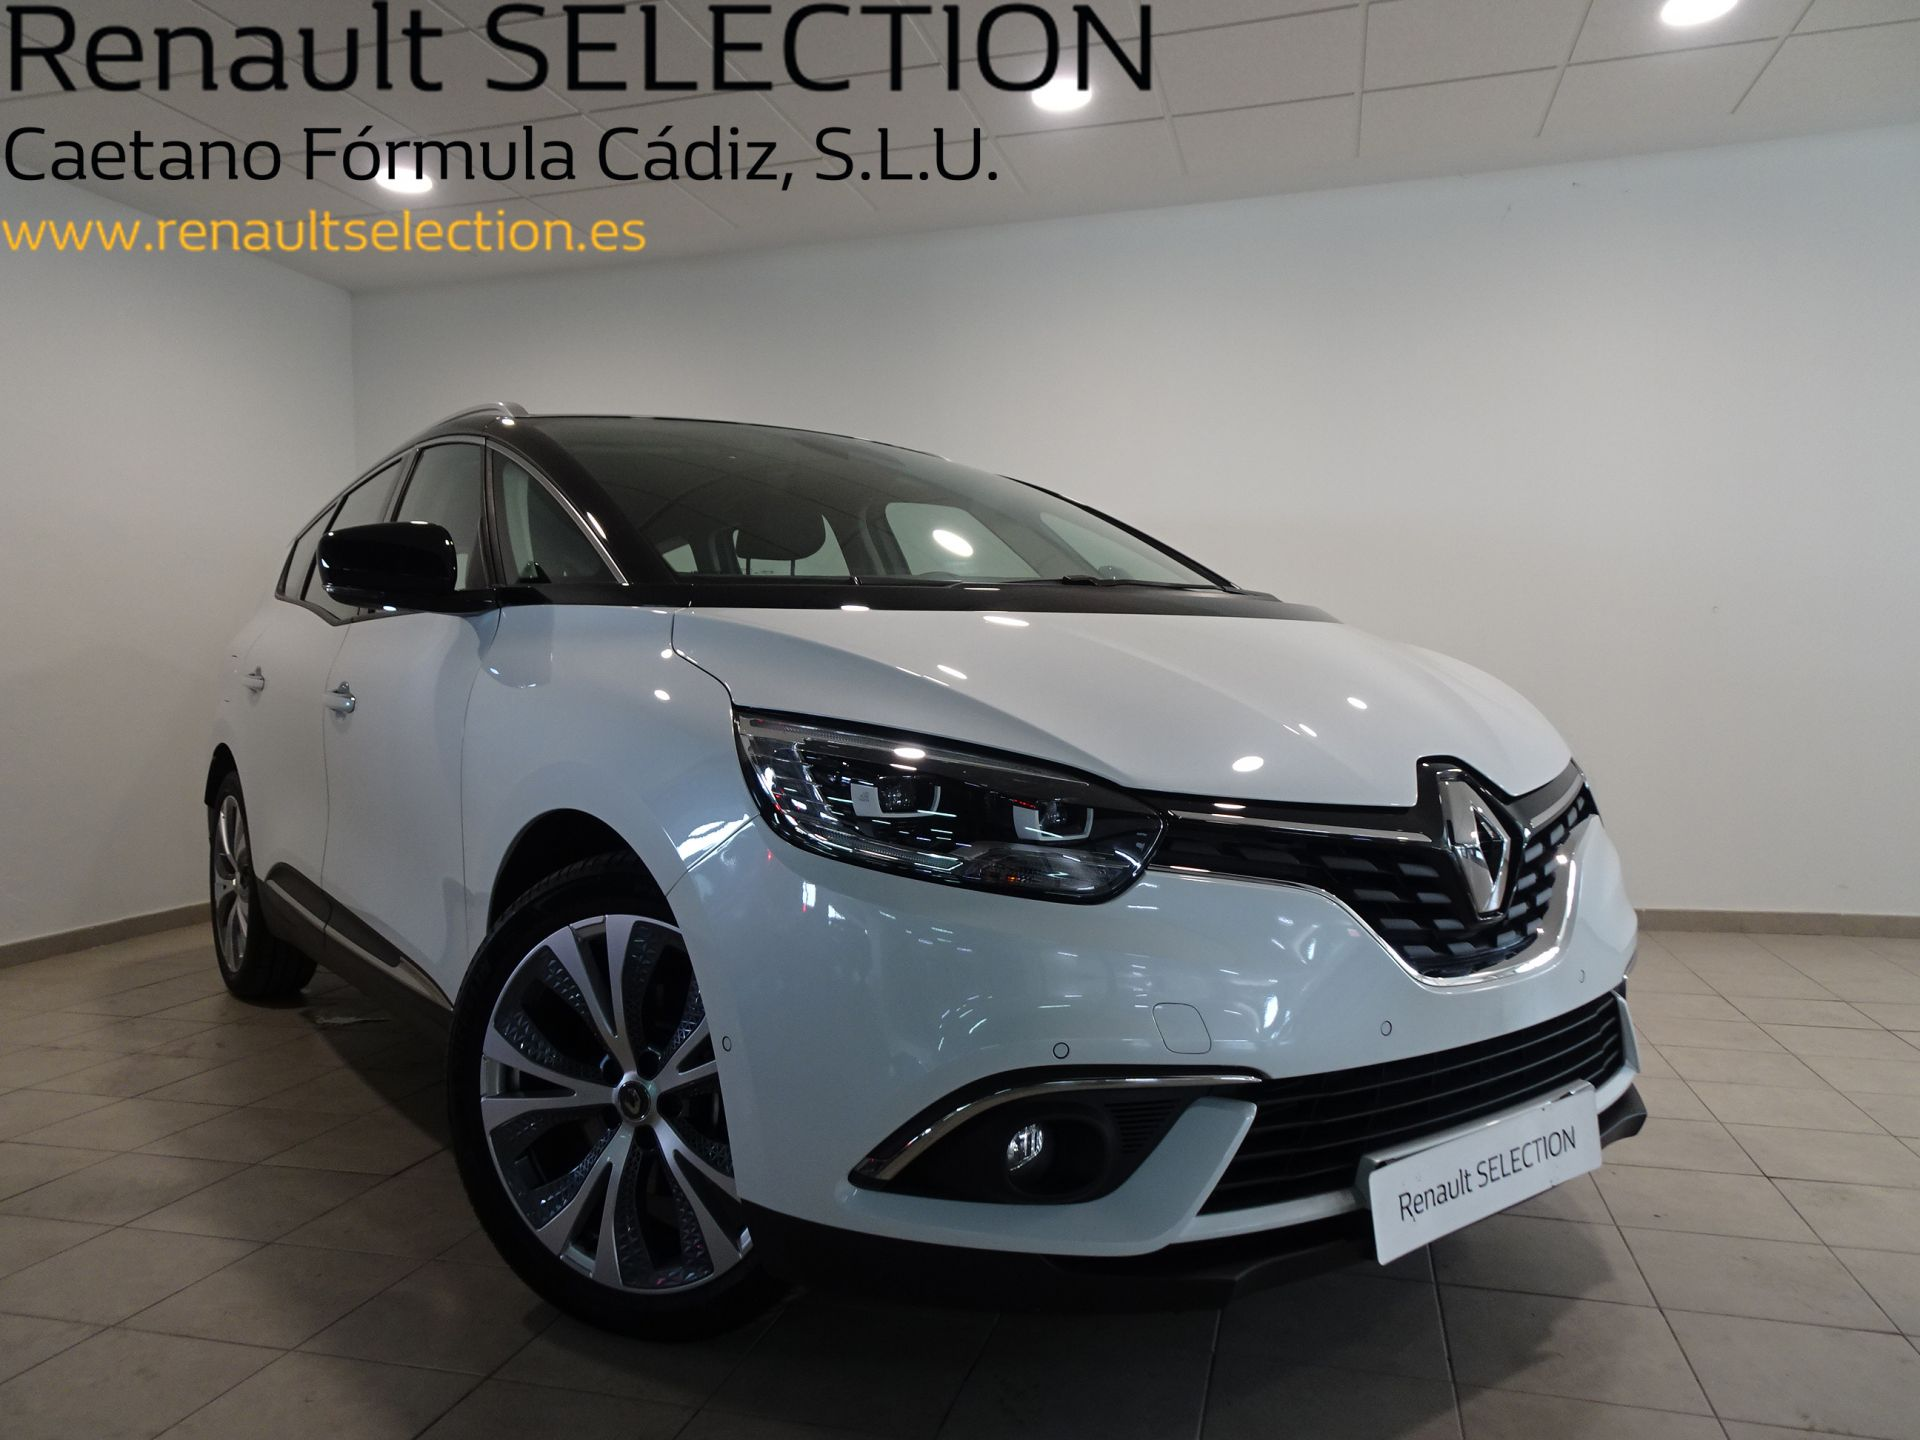 Renault Scenic Zen Blue dCi 110 kW (150CV) segunda mano Cádiz